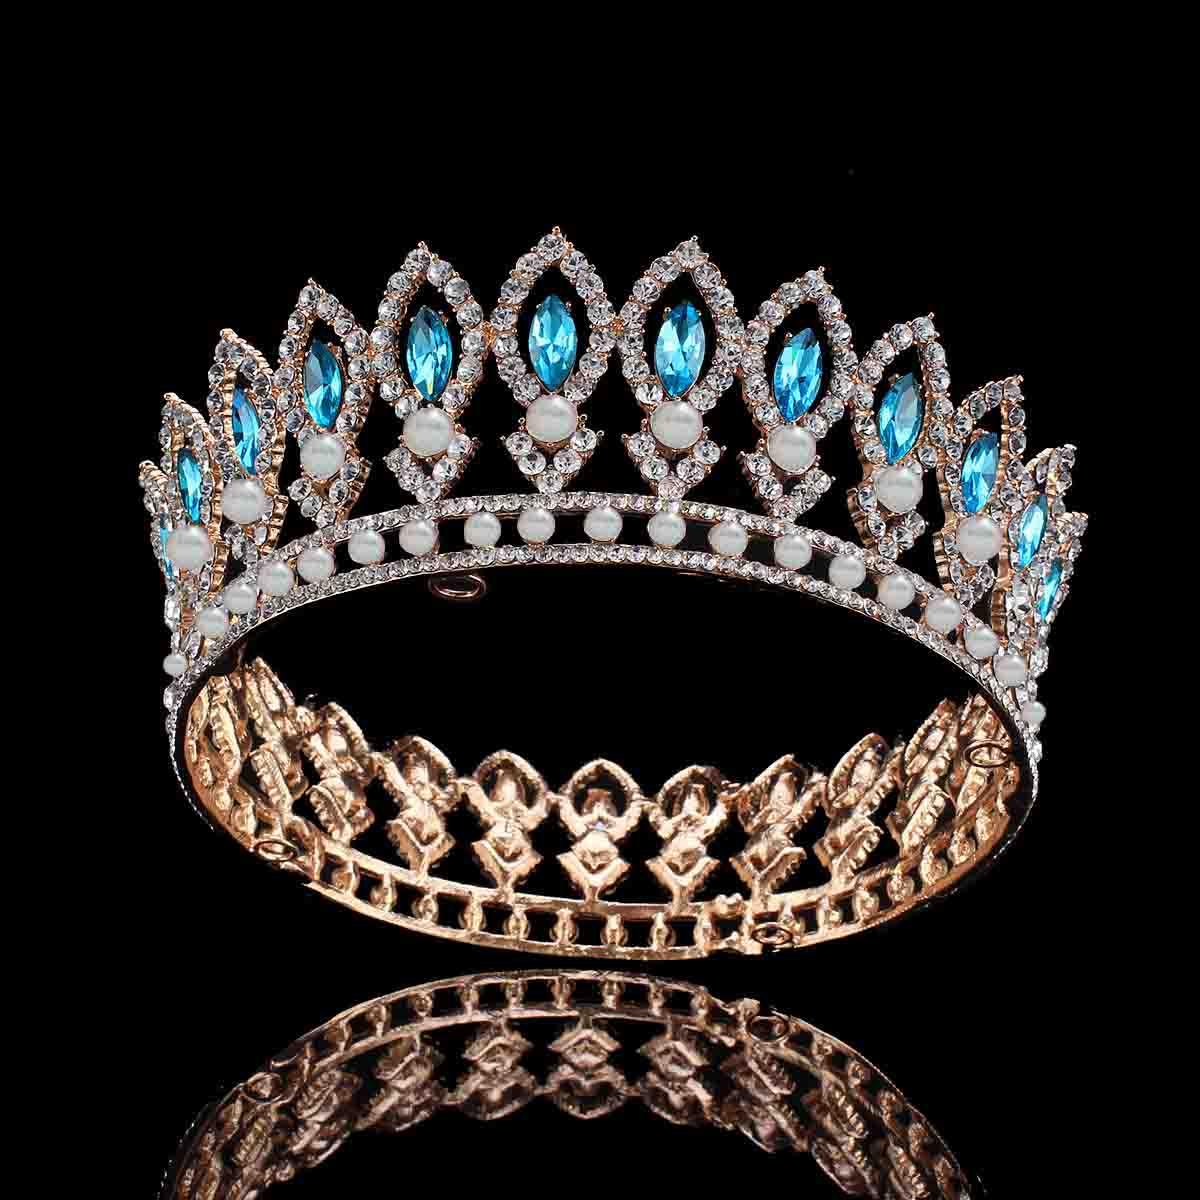 Wedding Headband Diamond 40 Ct Solid Gold Bridal Headpieces